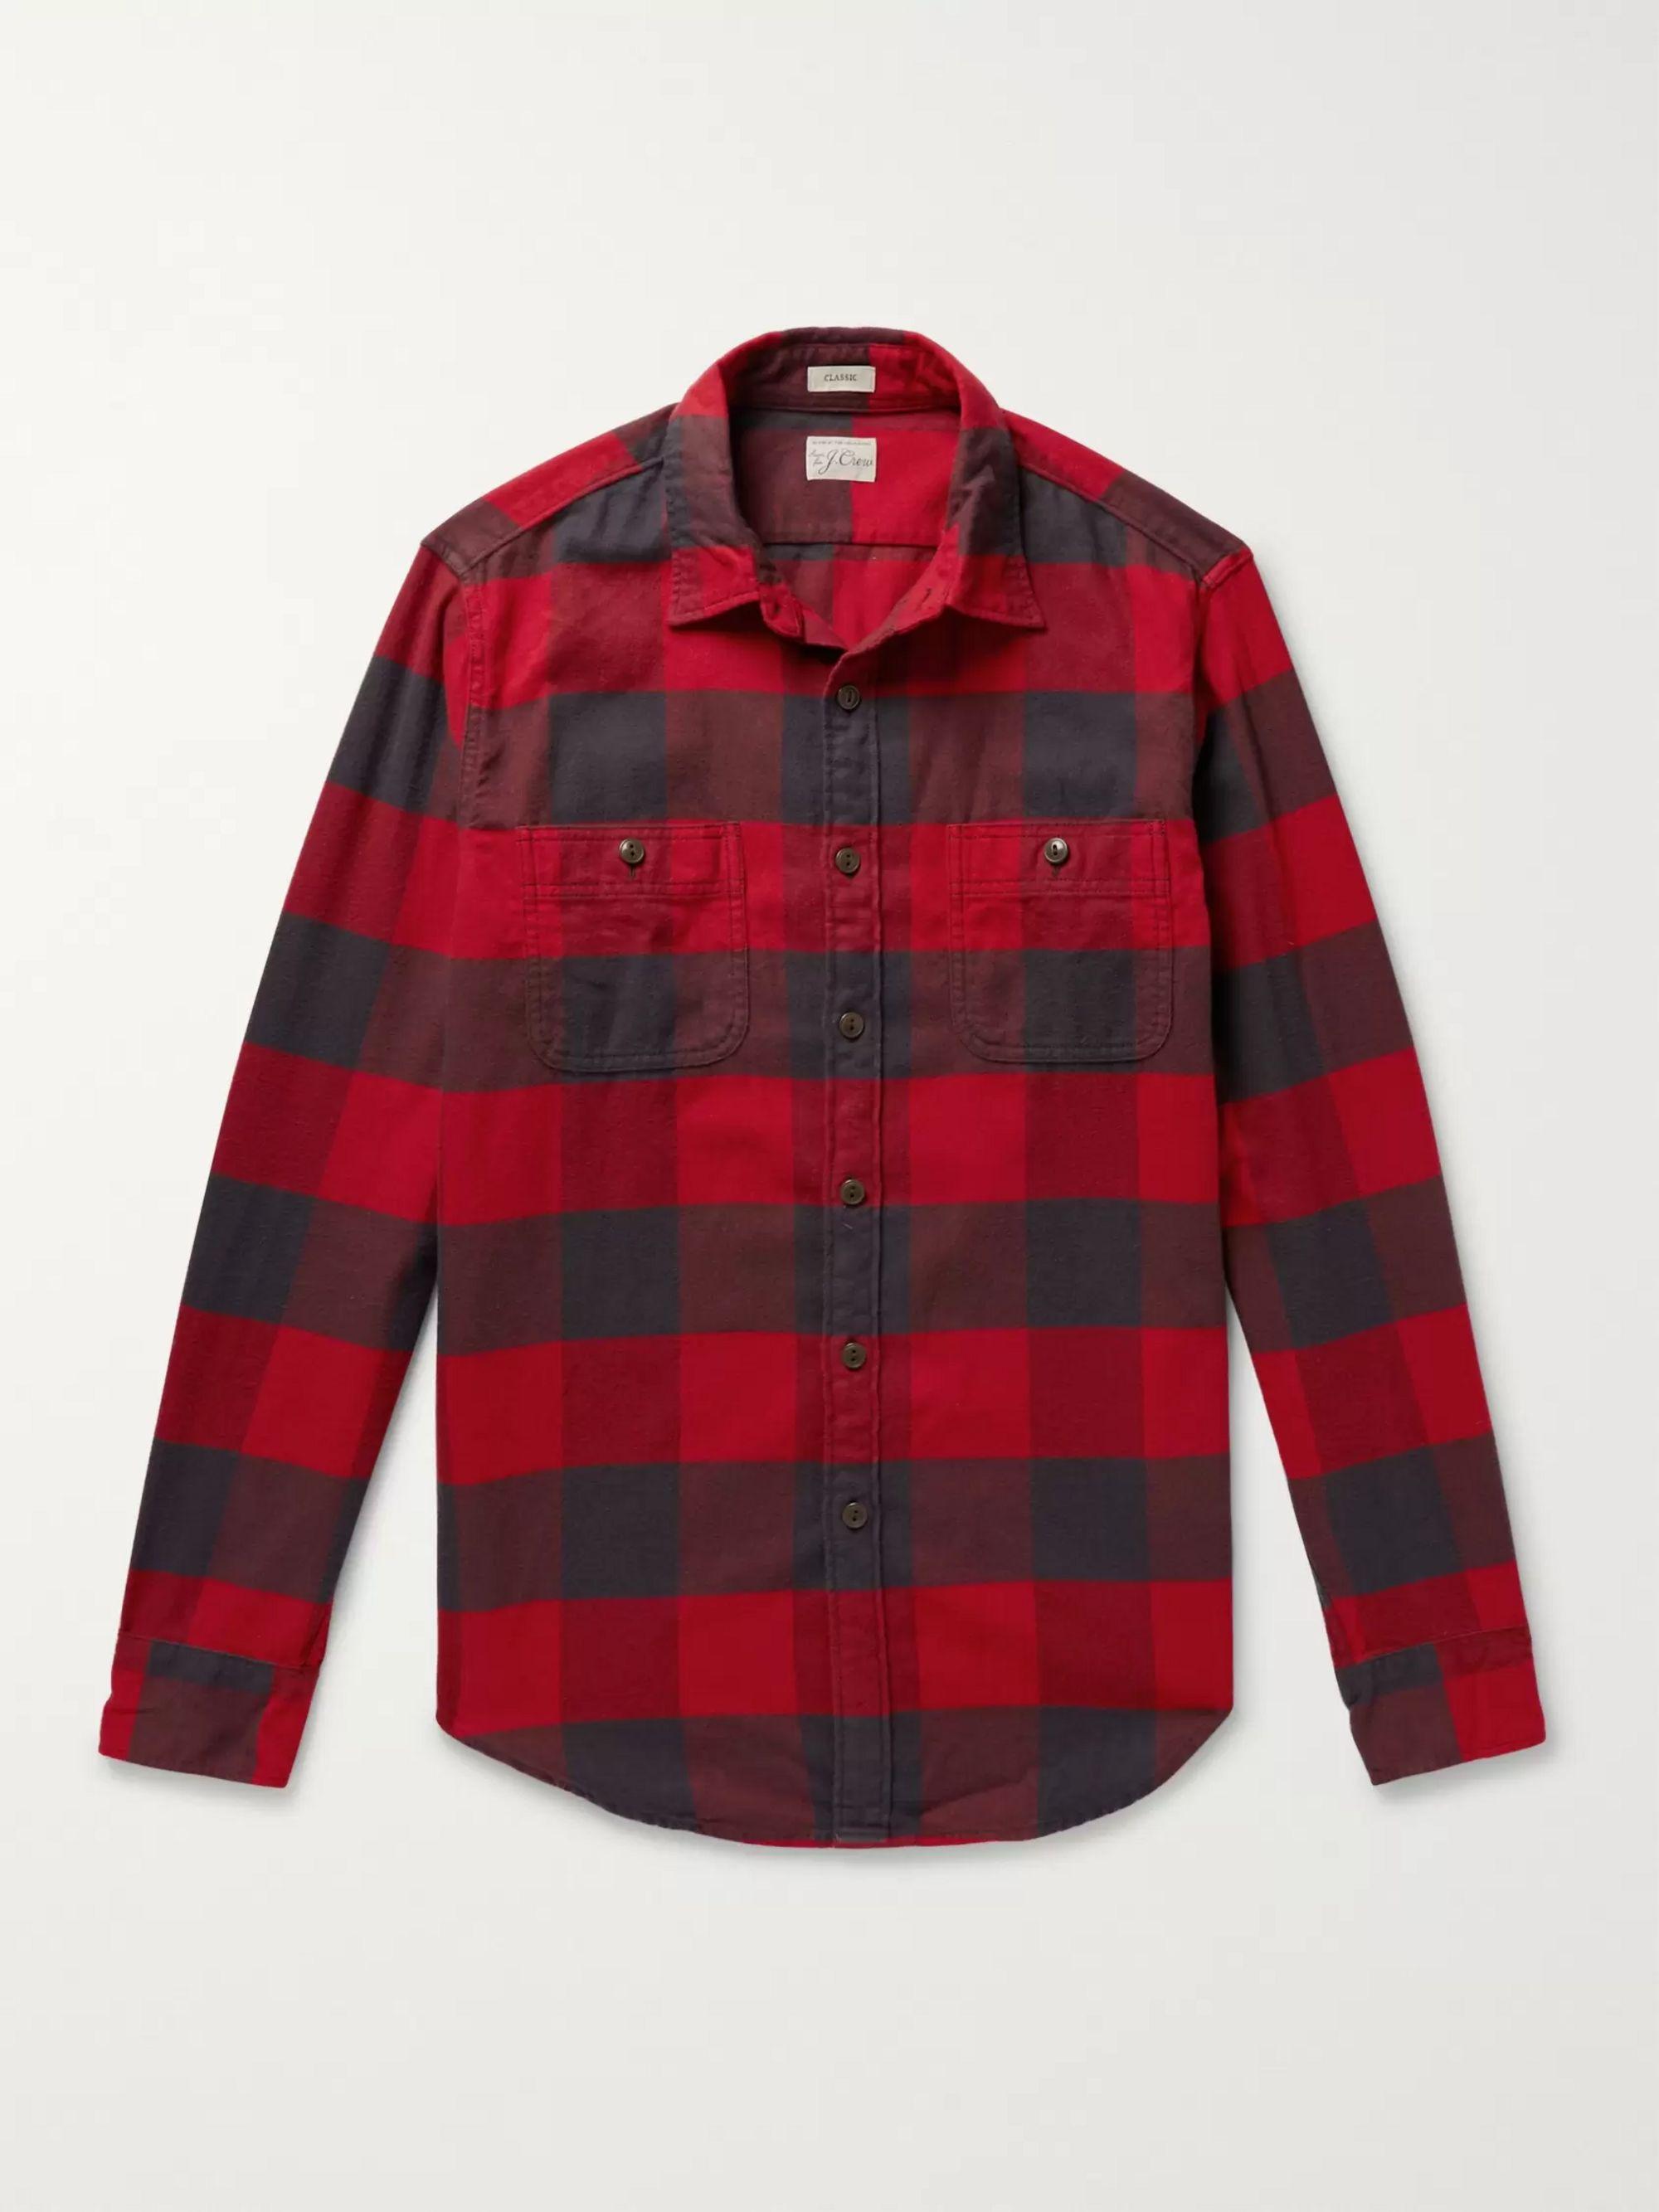 Buffalo Check Cotton Flannel Shirt